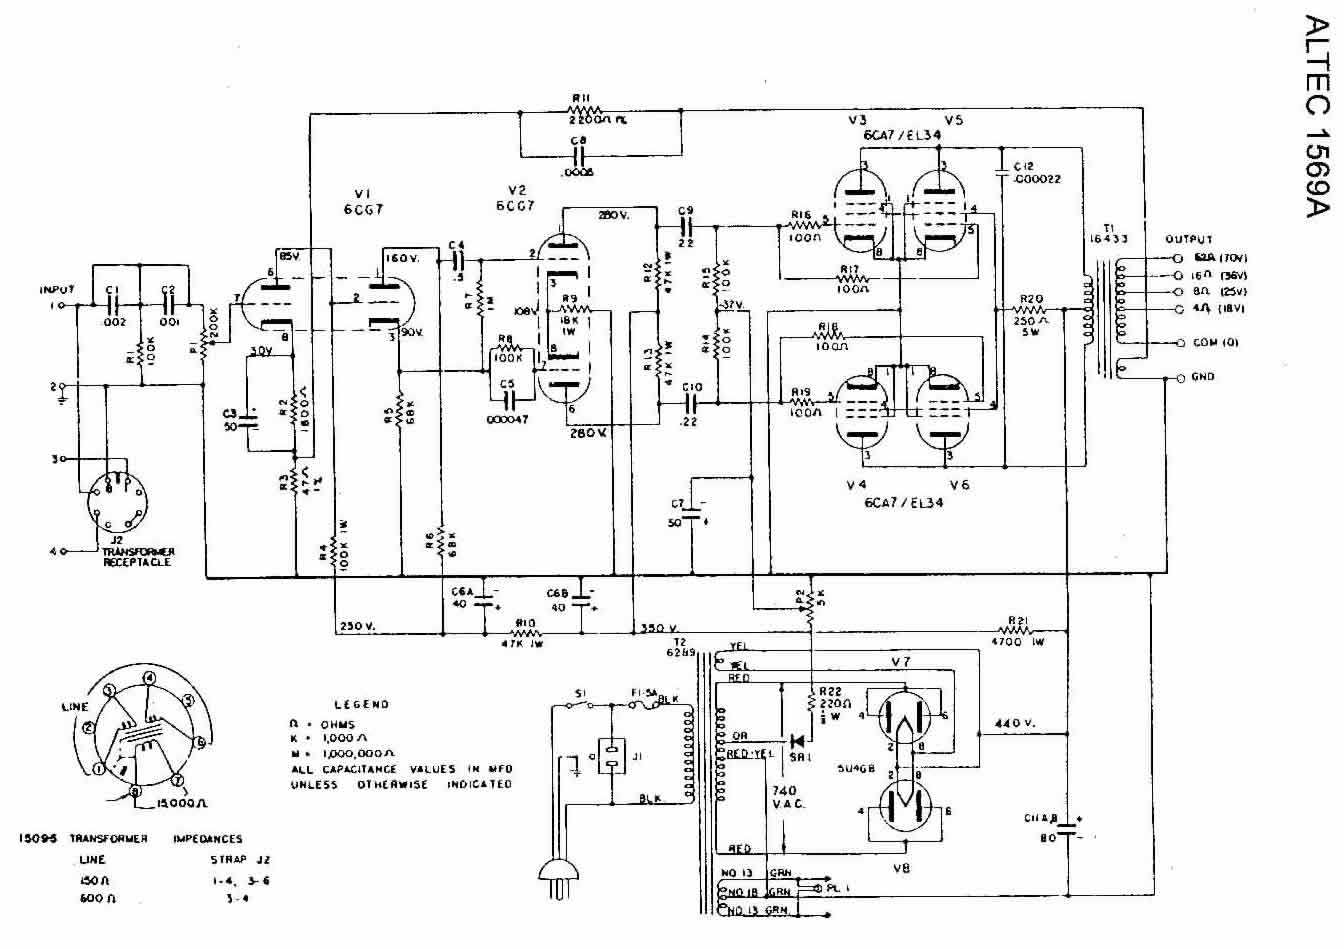 AN_5280] T Wiring Diagram Altec Download DiagramPhae Endut Blikvitt Librar Wiring 101